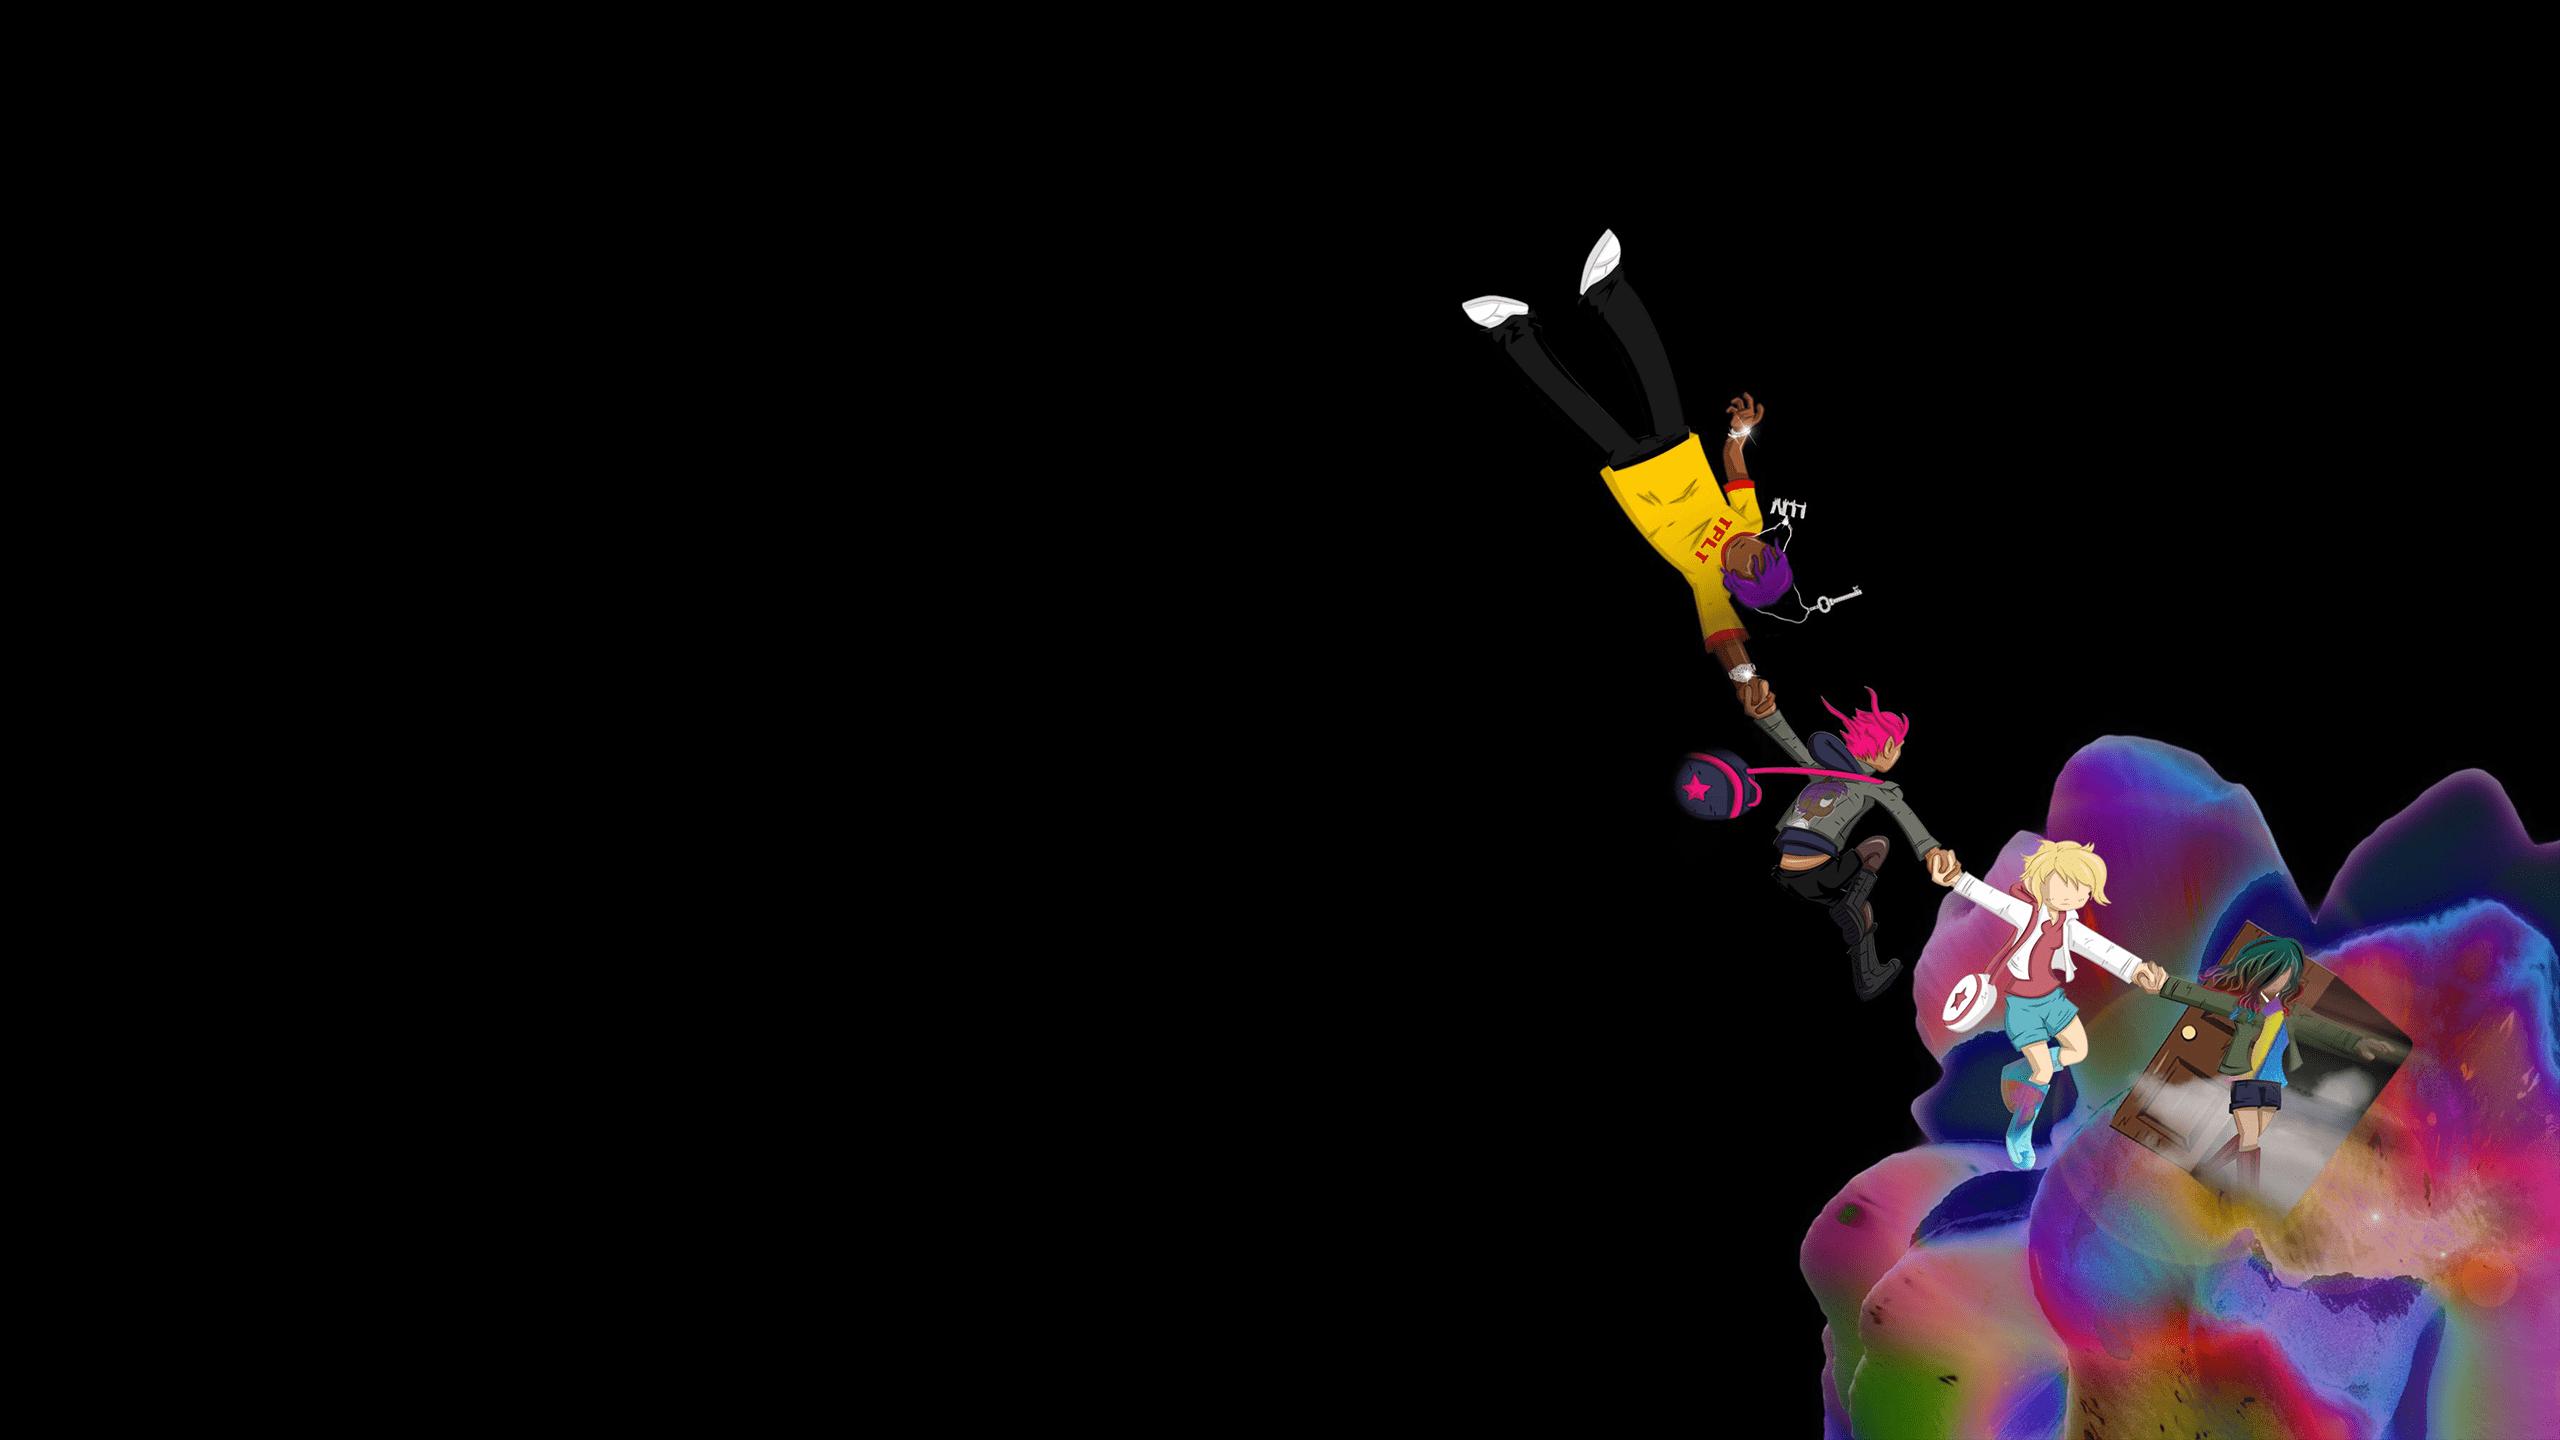 Lil Uzi Vert 4k Wallpapers Top Free Lil Uzi Vert 4k Backgrounds Wallpaperaccess Lil uzi vert previews new music during livestream style, sneakers, art, design, news, music, gadgets, gear, technology, vehicles. lil uzi vert 4k wallpapers top free